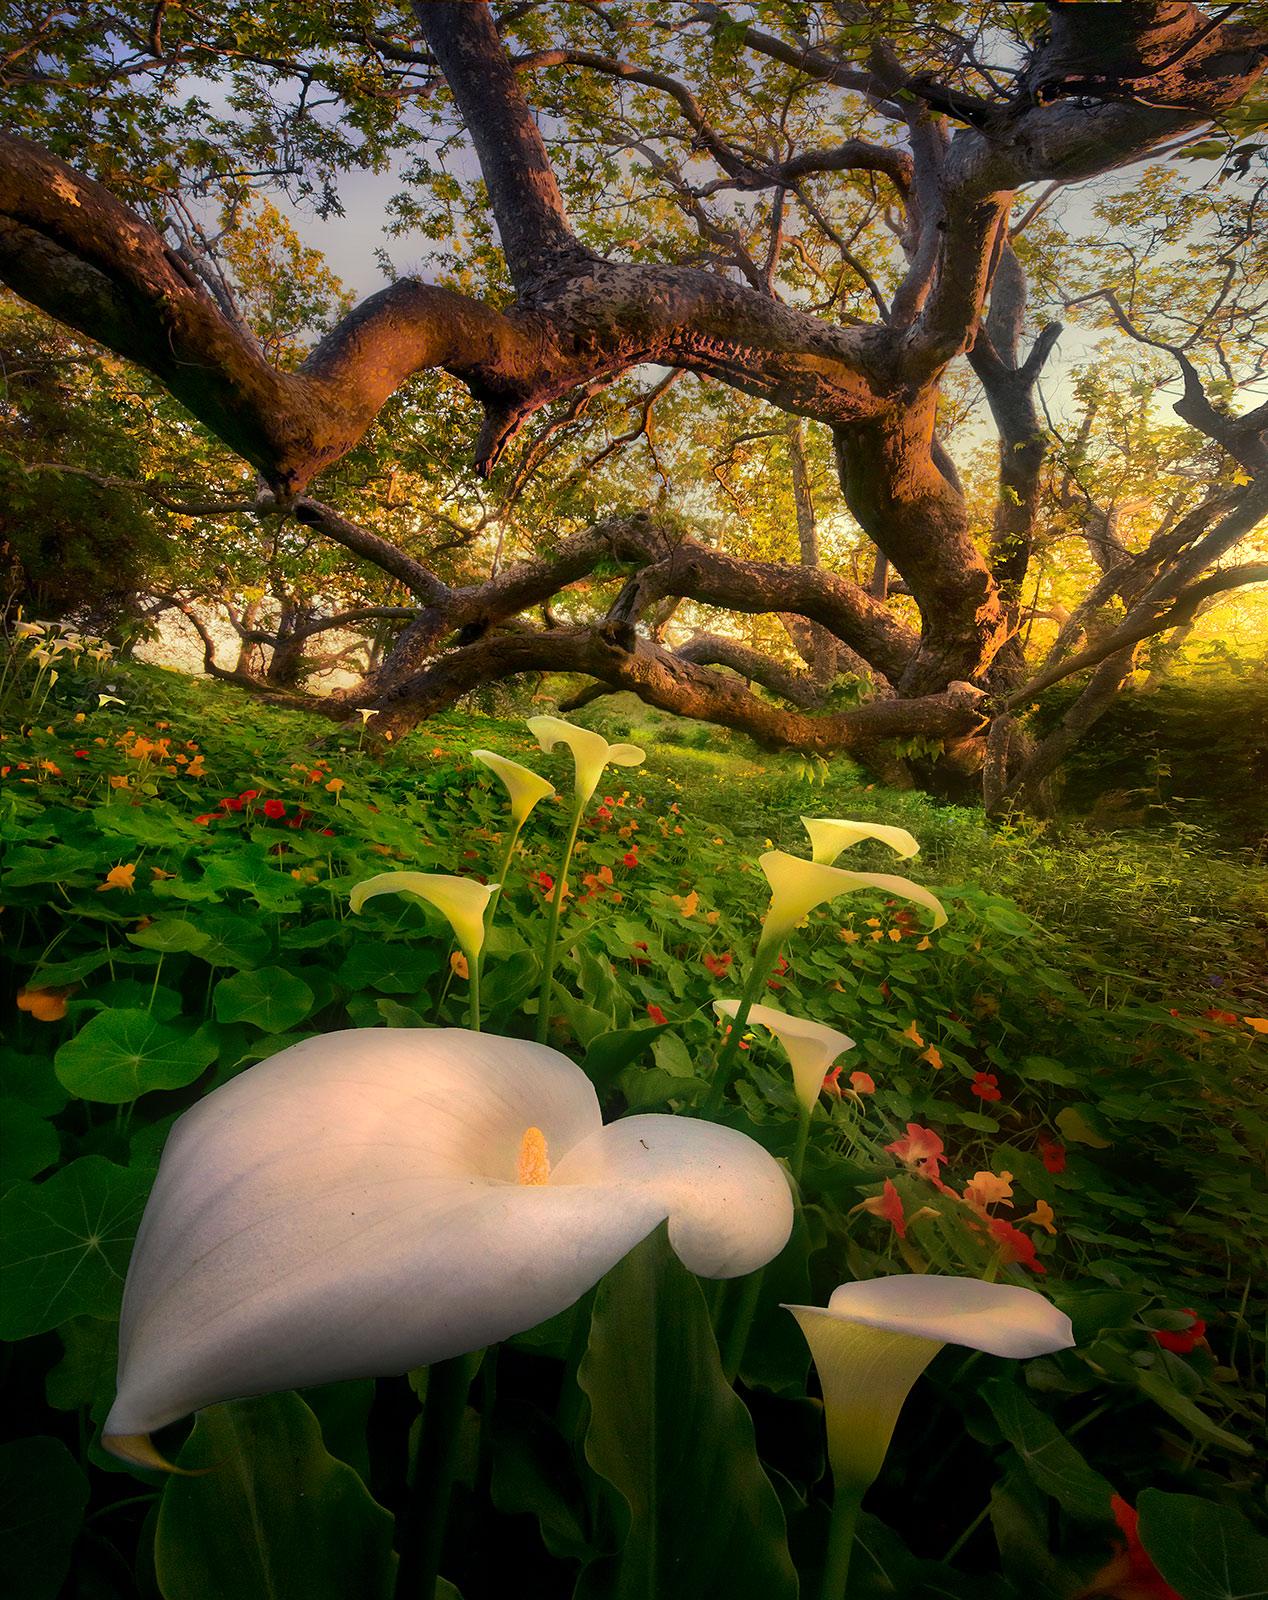 eucalyptus, california, lilies, coast, sunset, forest, photo